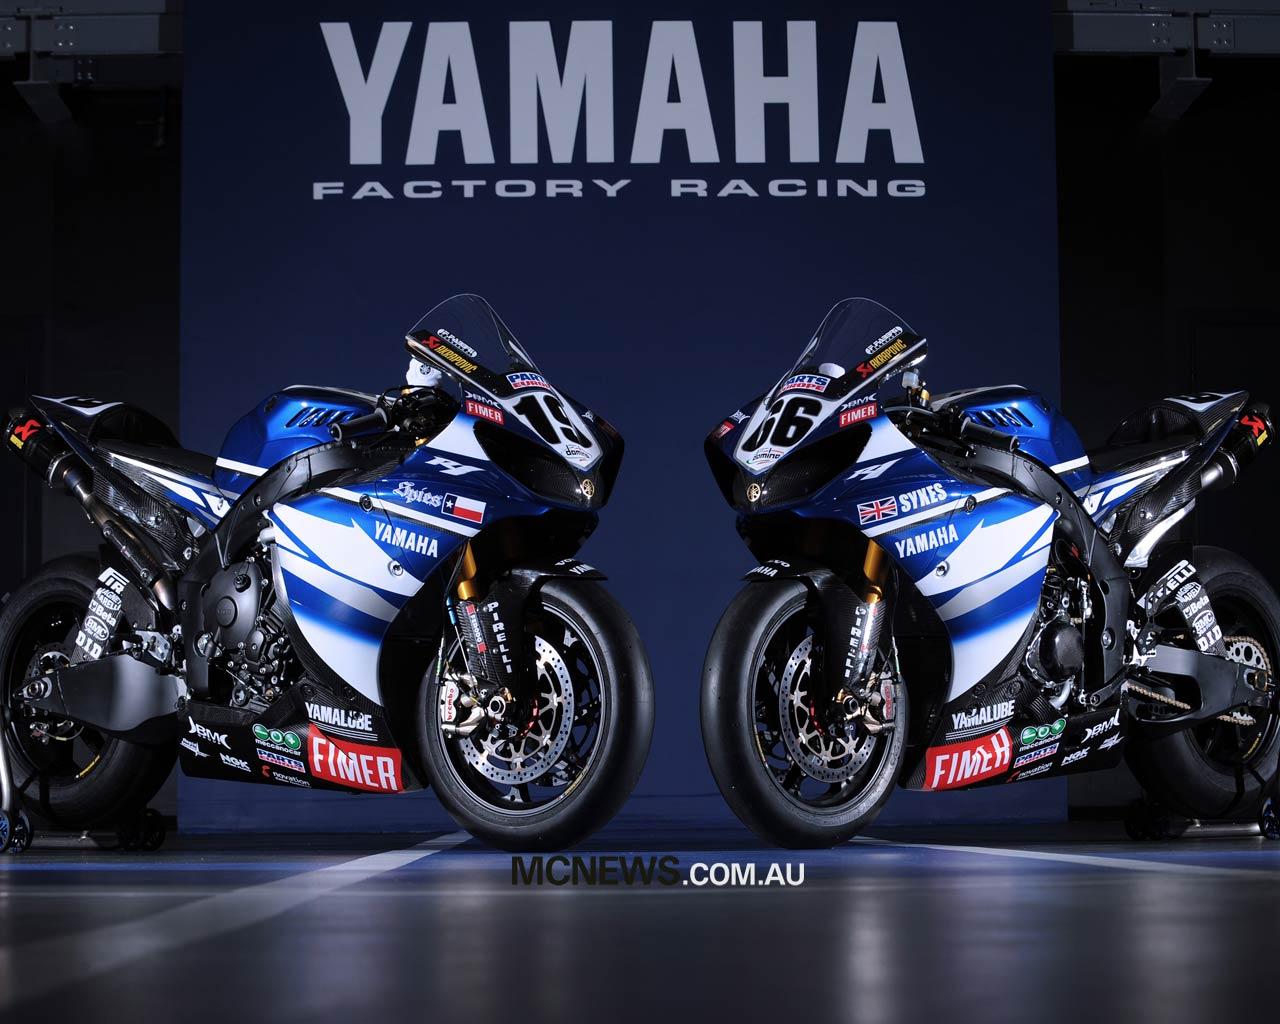 bikes wallpapers Yamaha R1 SuperBike Wallpapers 1280x1024